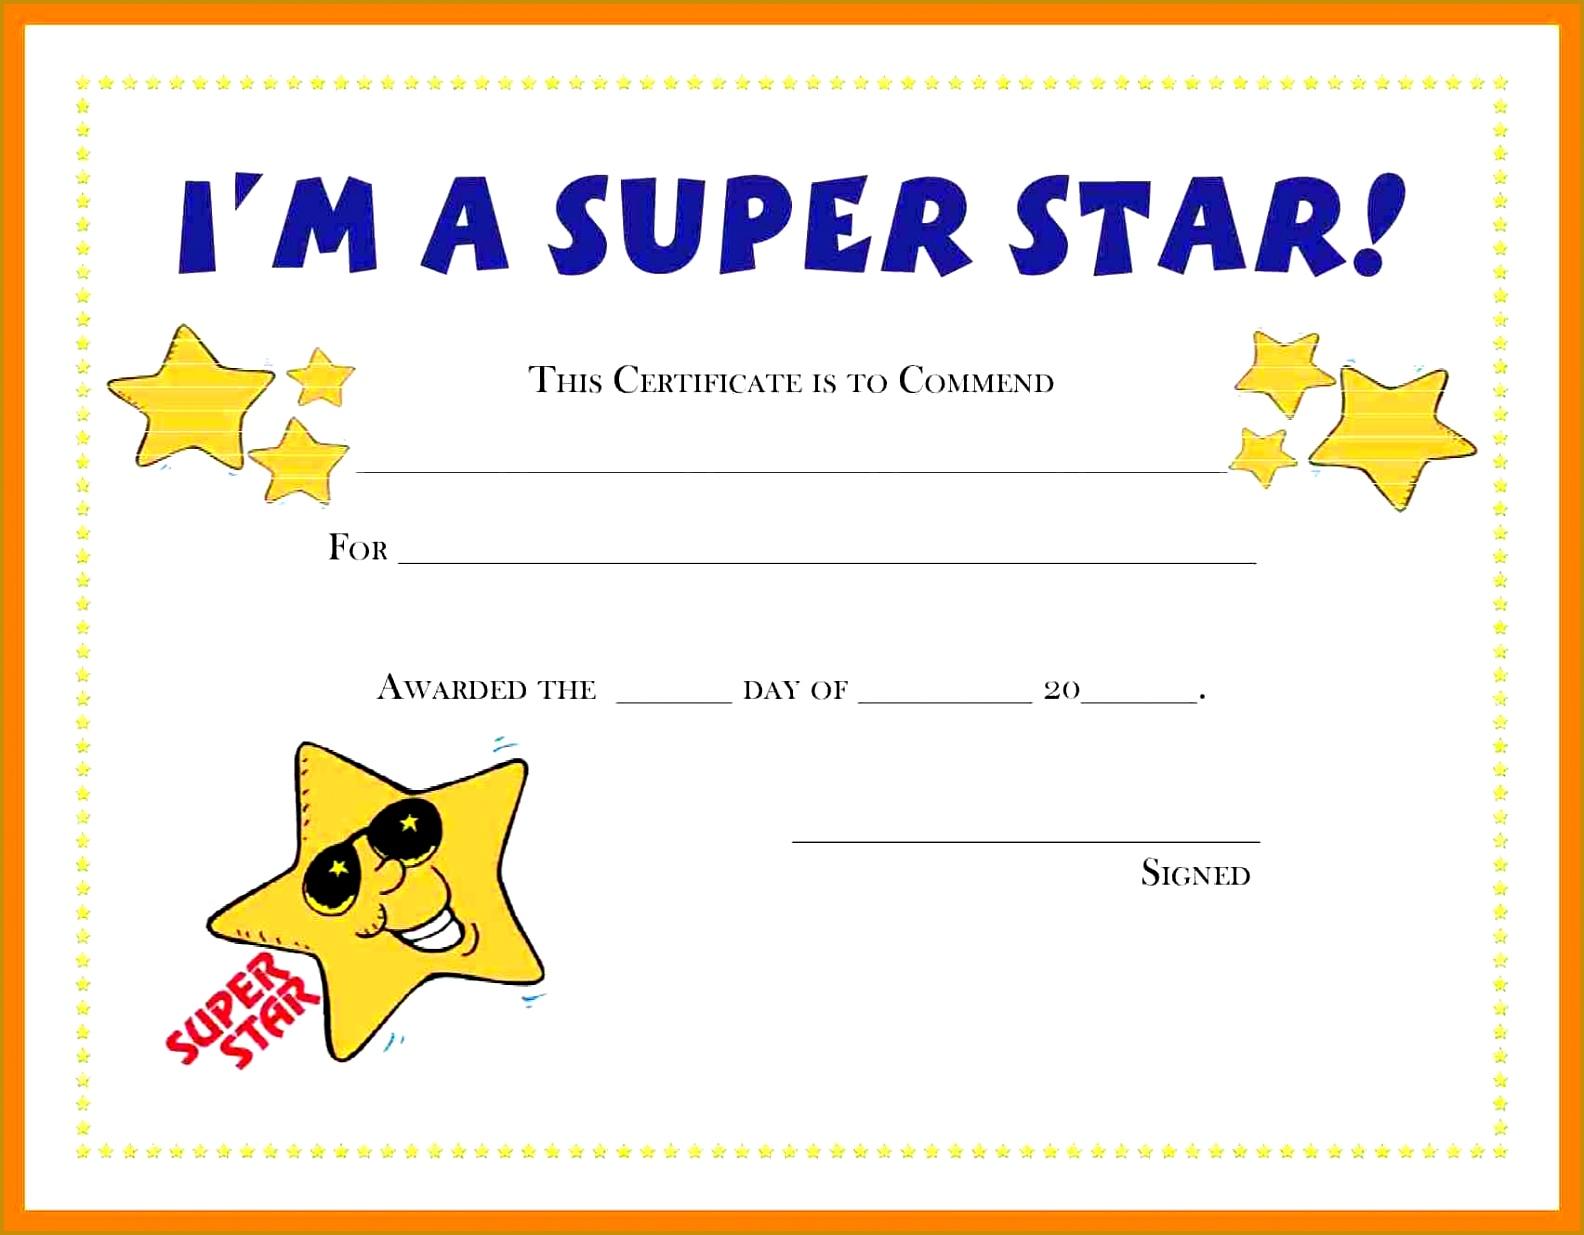 6 Blank Award Certificate Templates Animal Caretaker Sample Resume Great Job Certificates Great Job Certificate Printable Printable Award Certificates 12351584